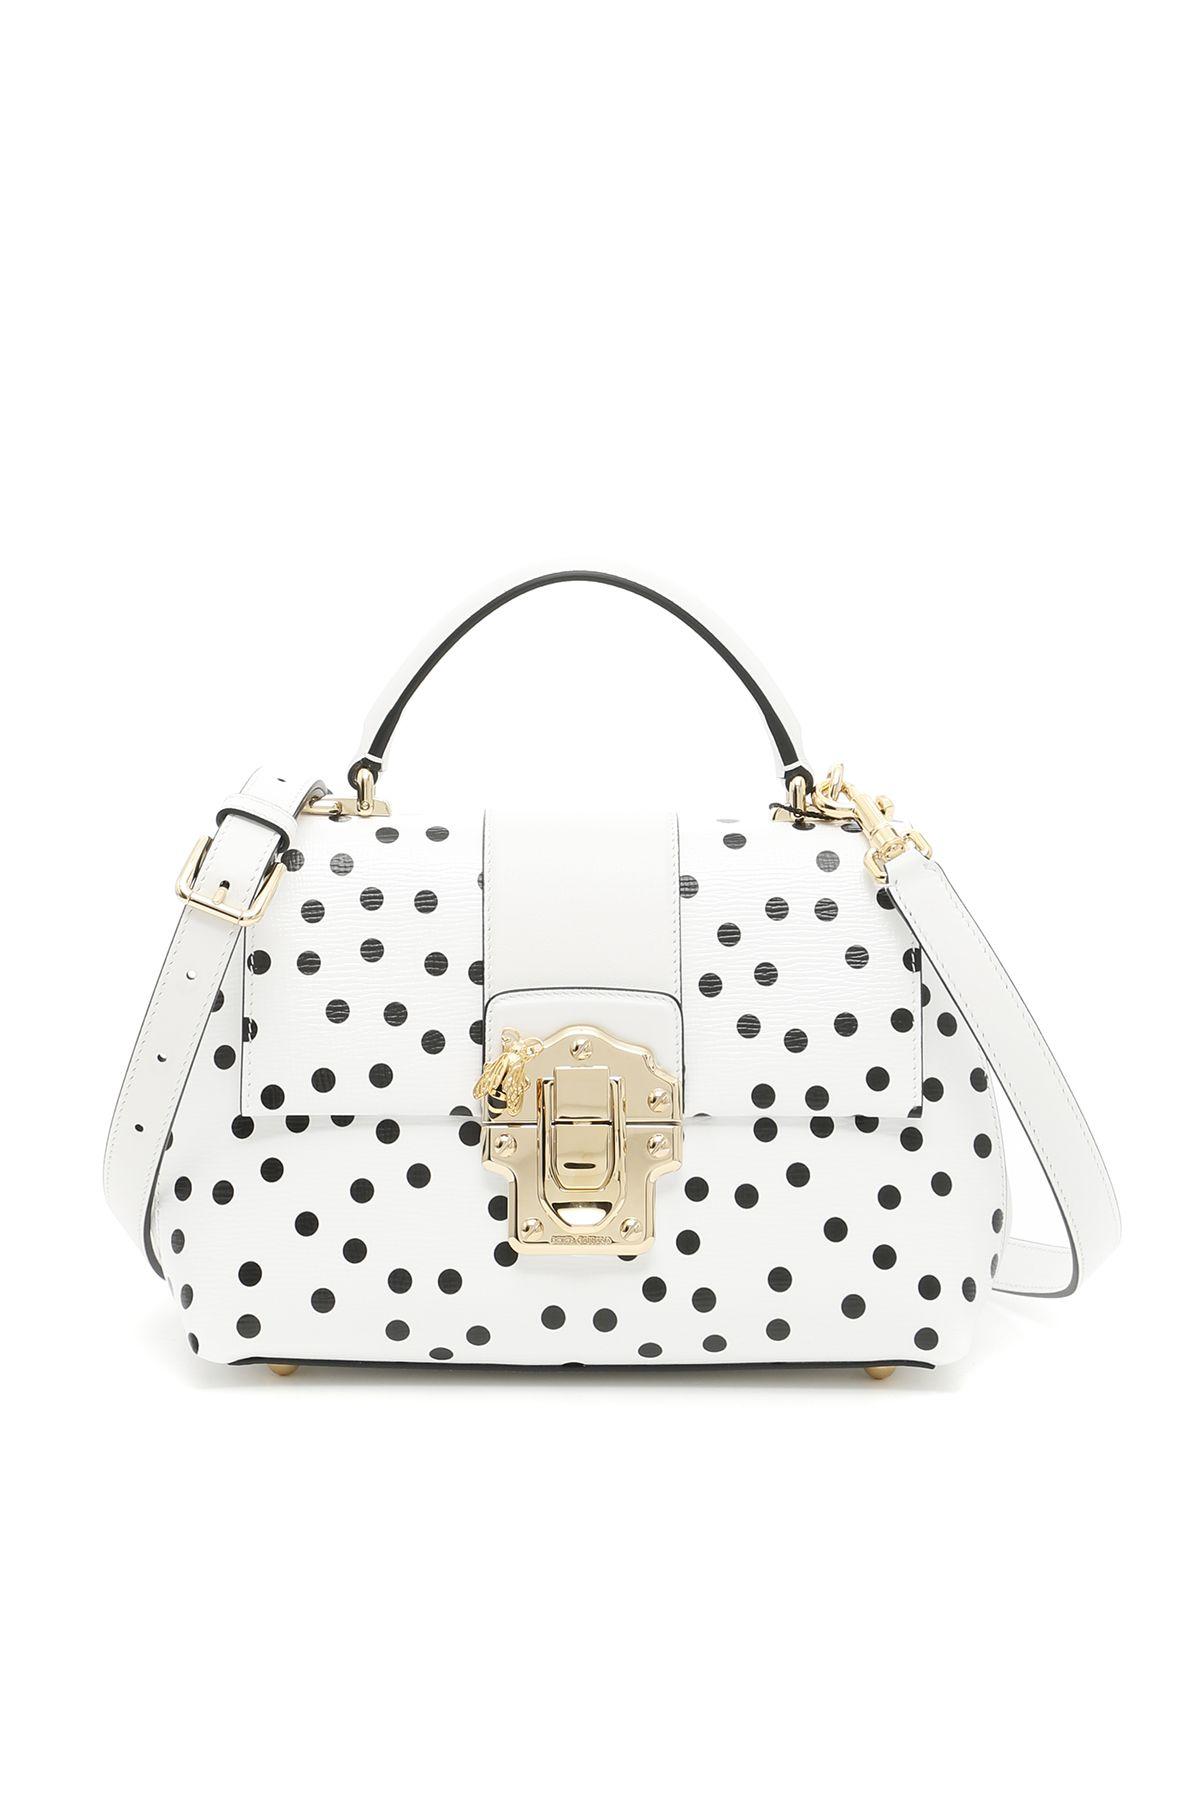 7ed5783a85e Dolce   Gabbana Lucia Bag In Pois Piccolo Fdo Biancobianco   ModeSens